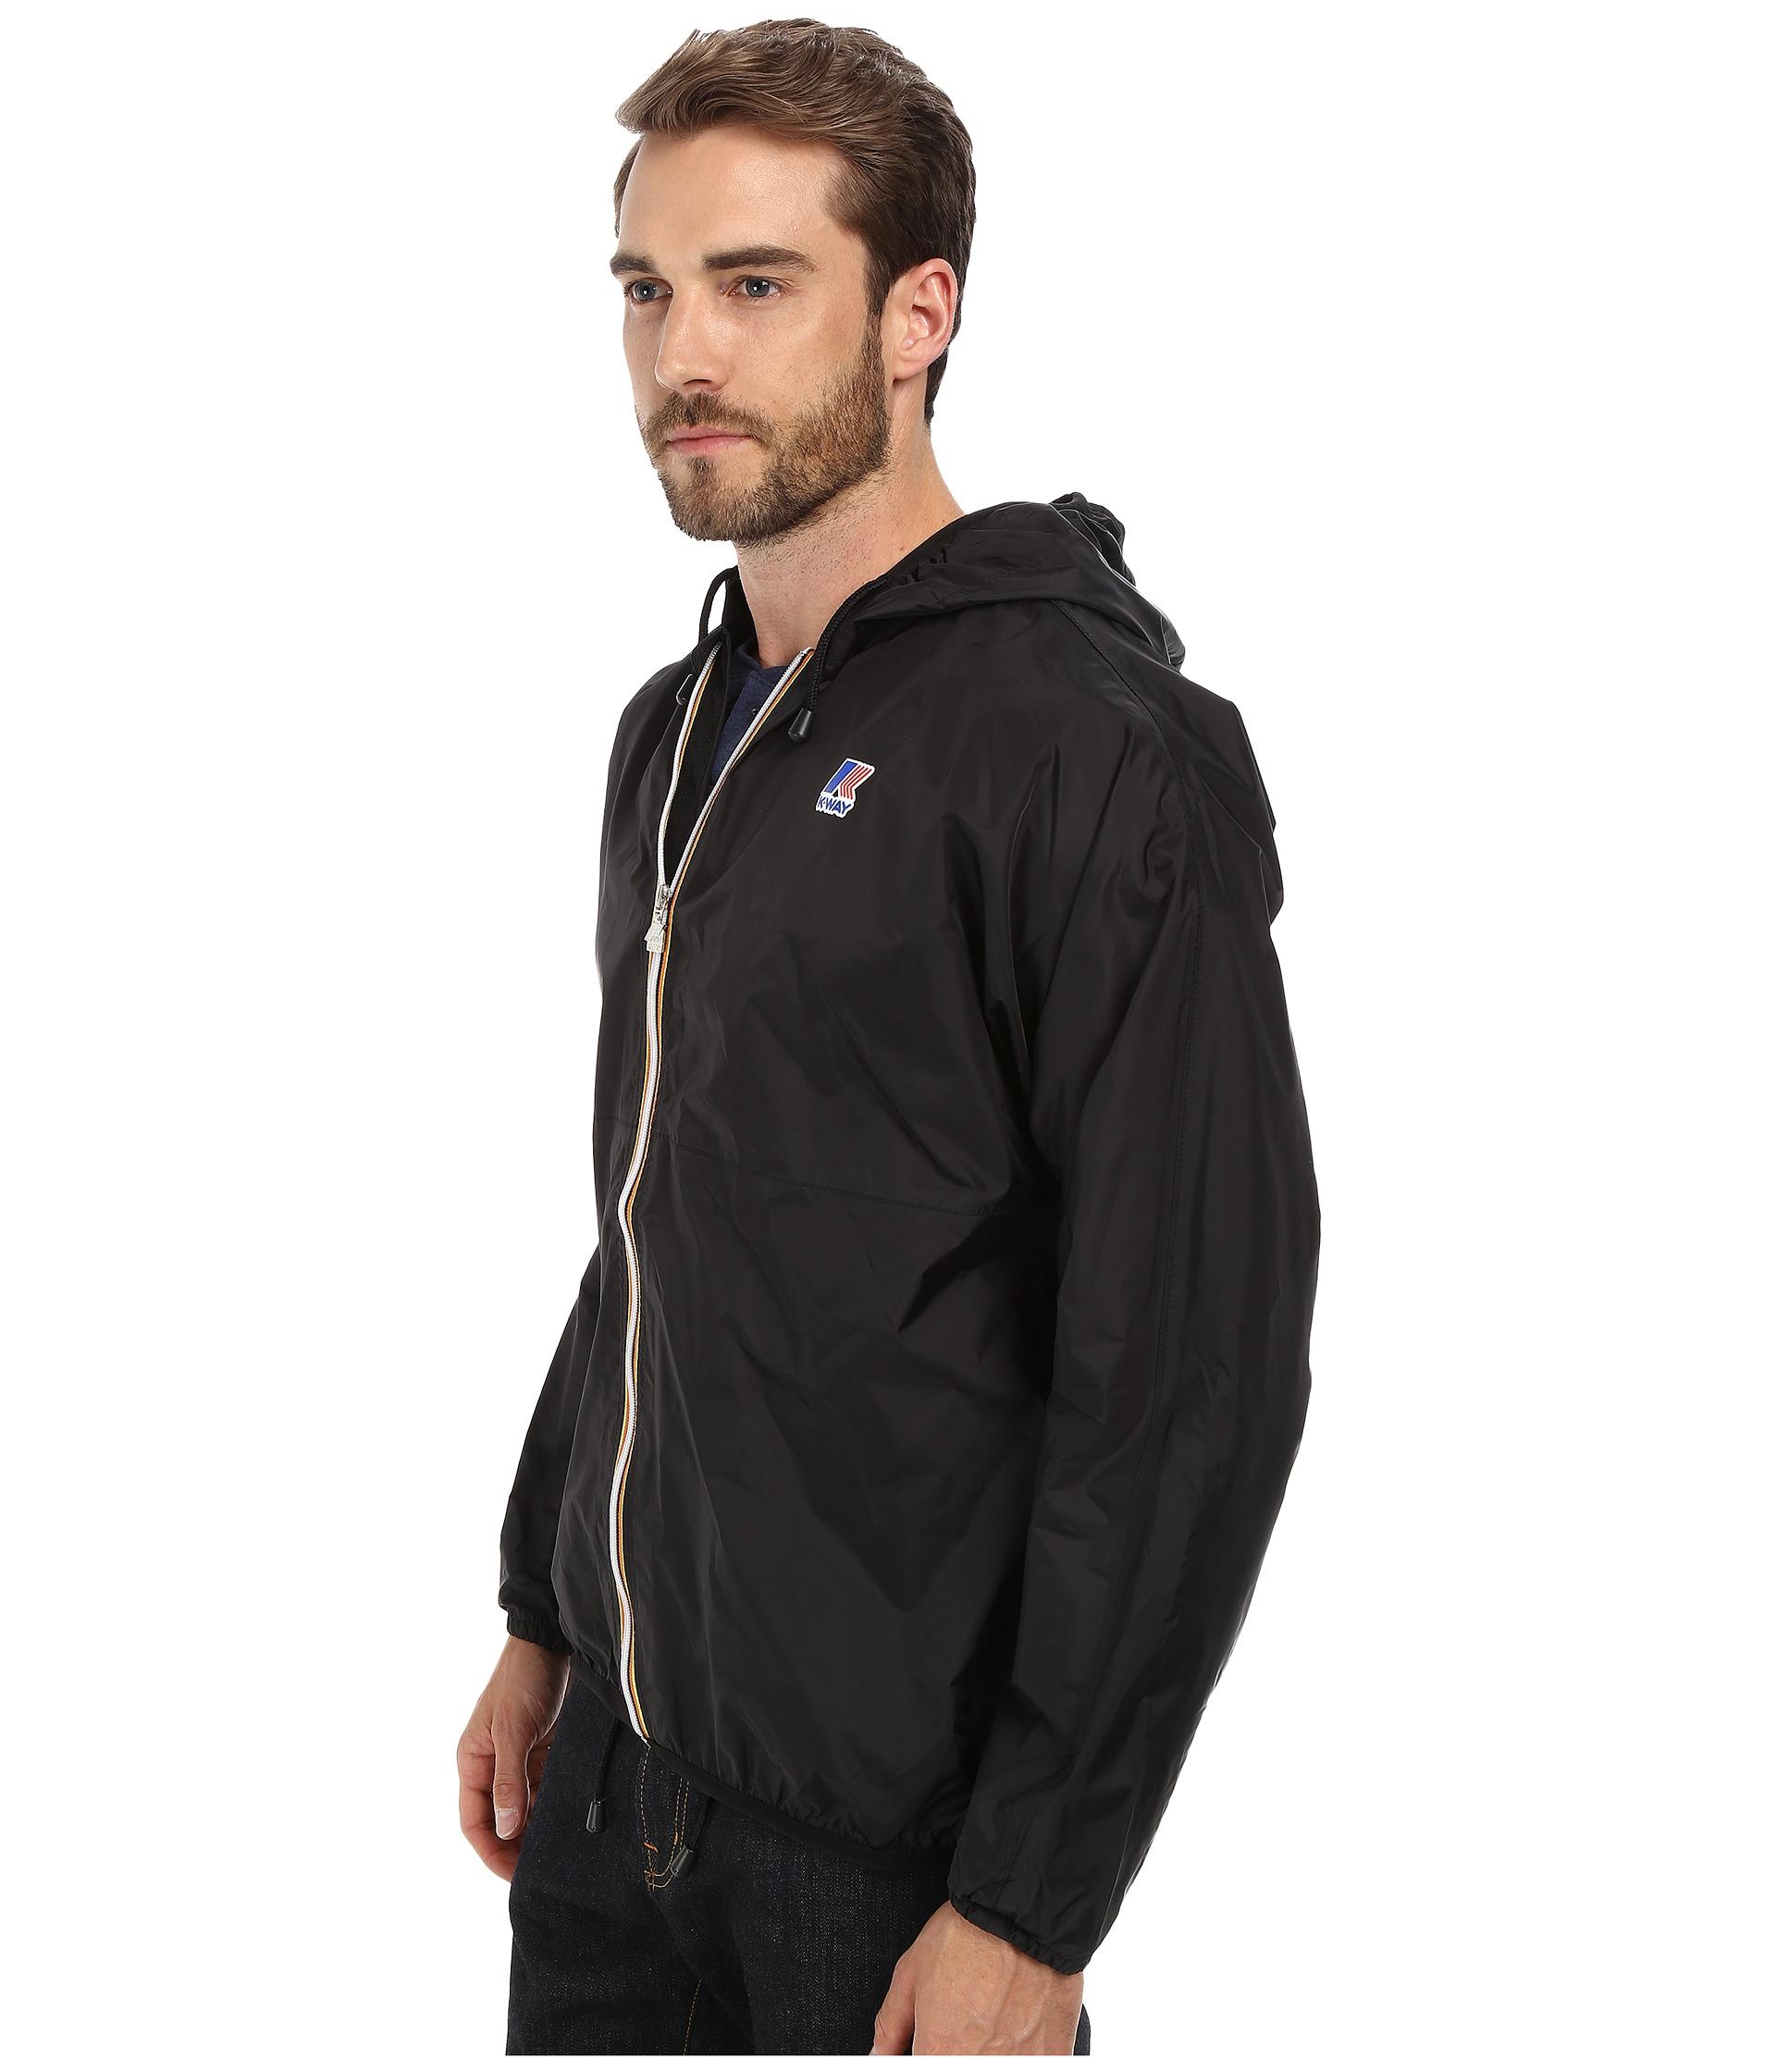 k way claude klassic waterproof jacket w hood black free shipping both ways. Black Bedroom Furniture Sets. Home Design Ideas